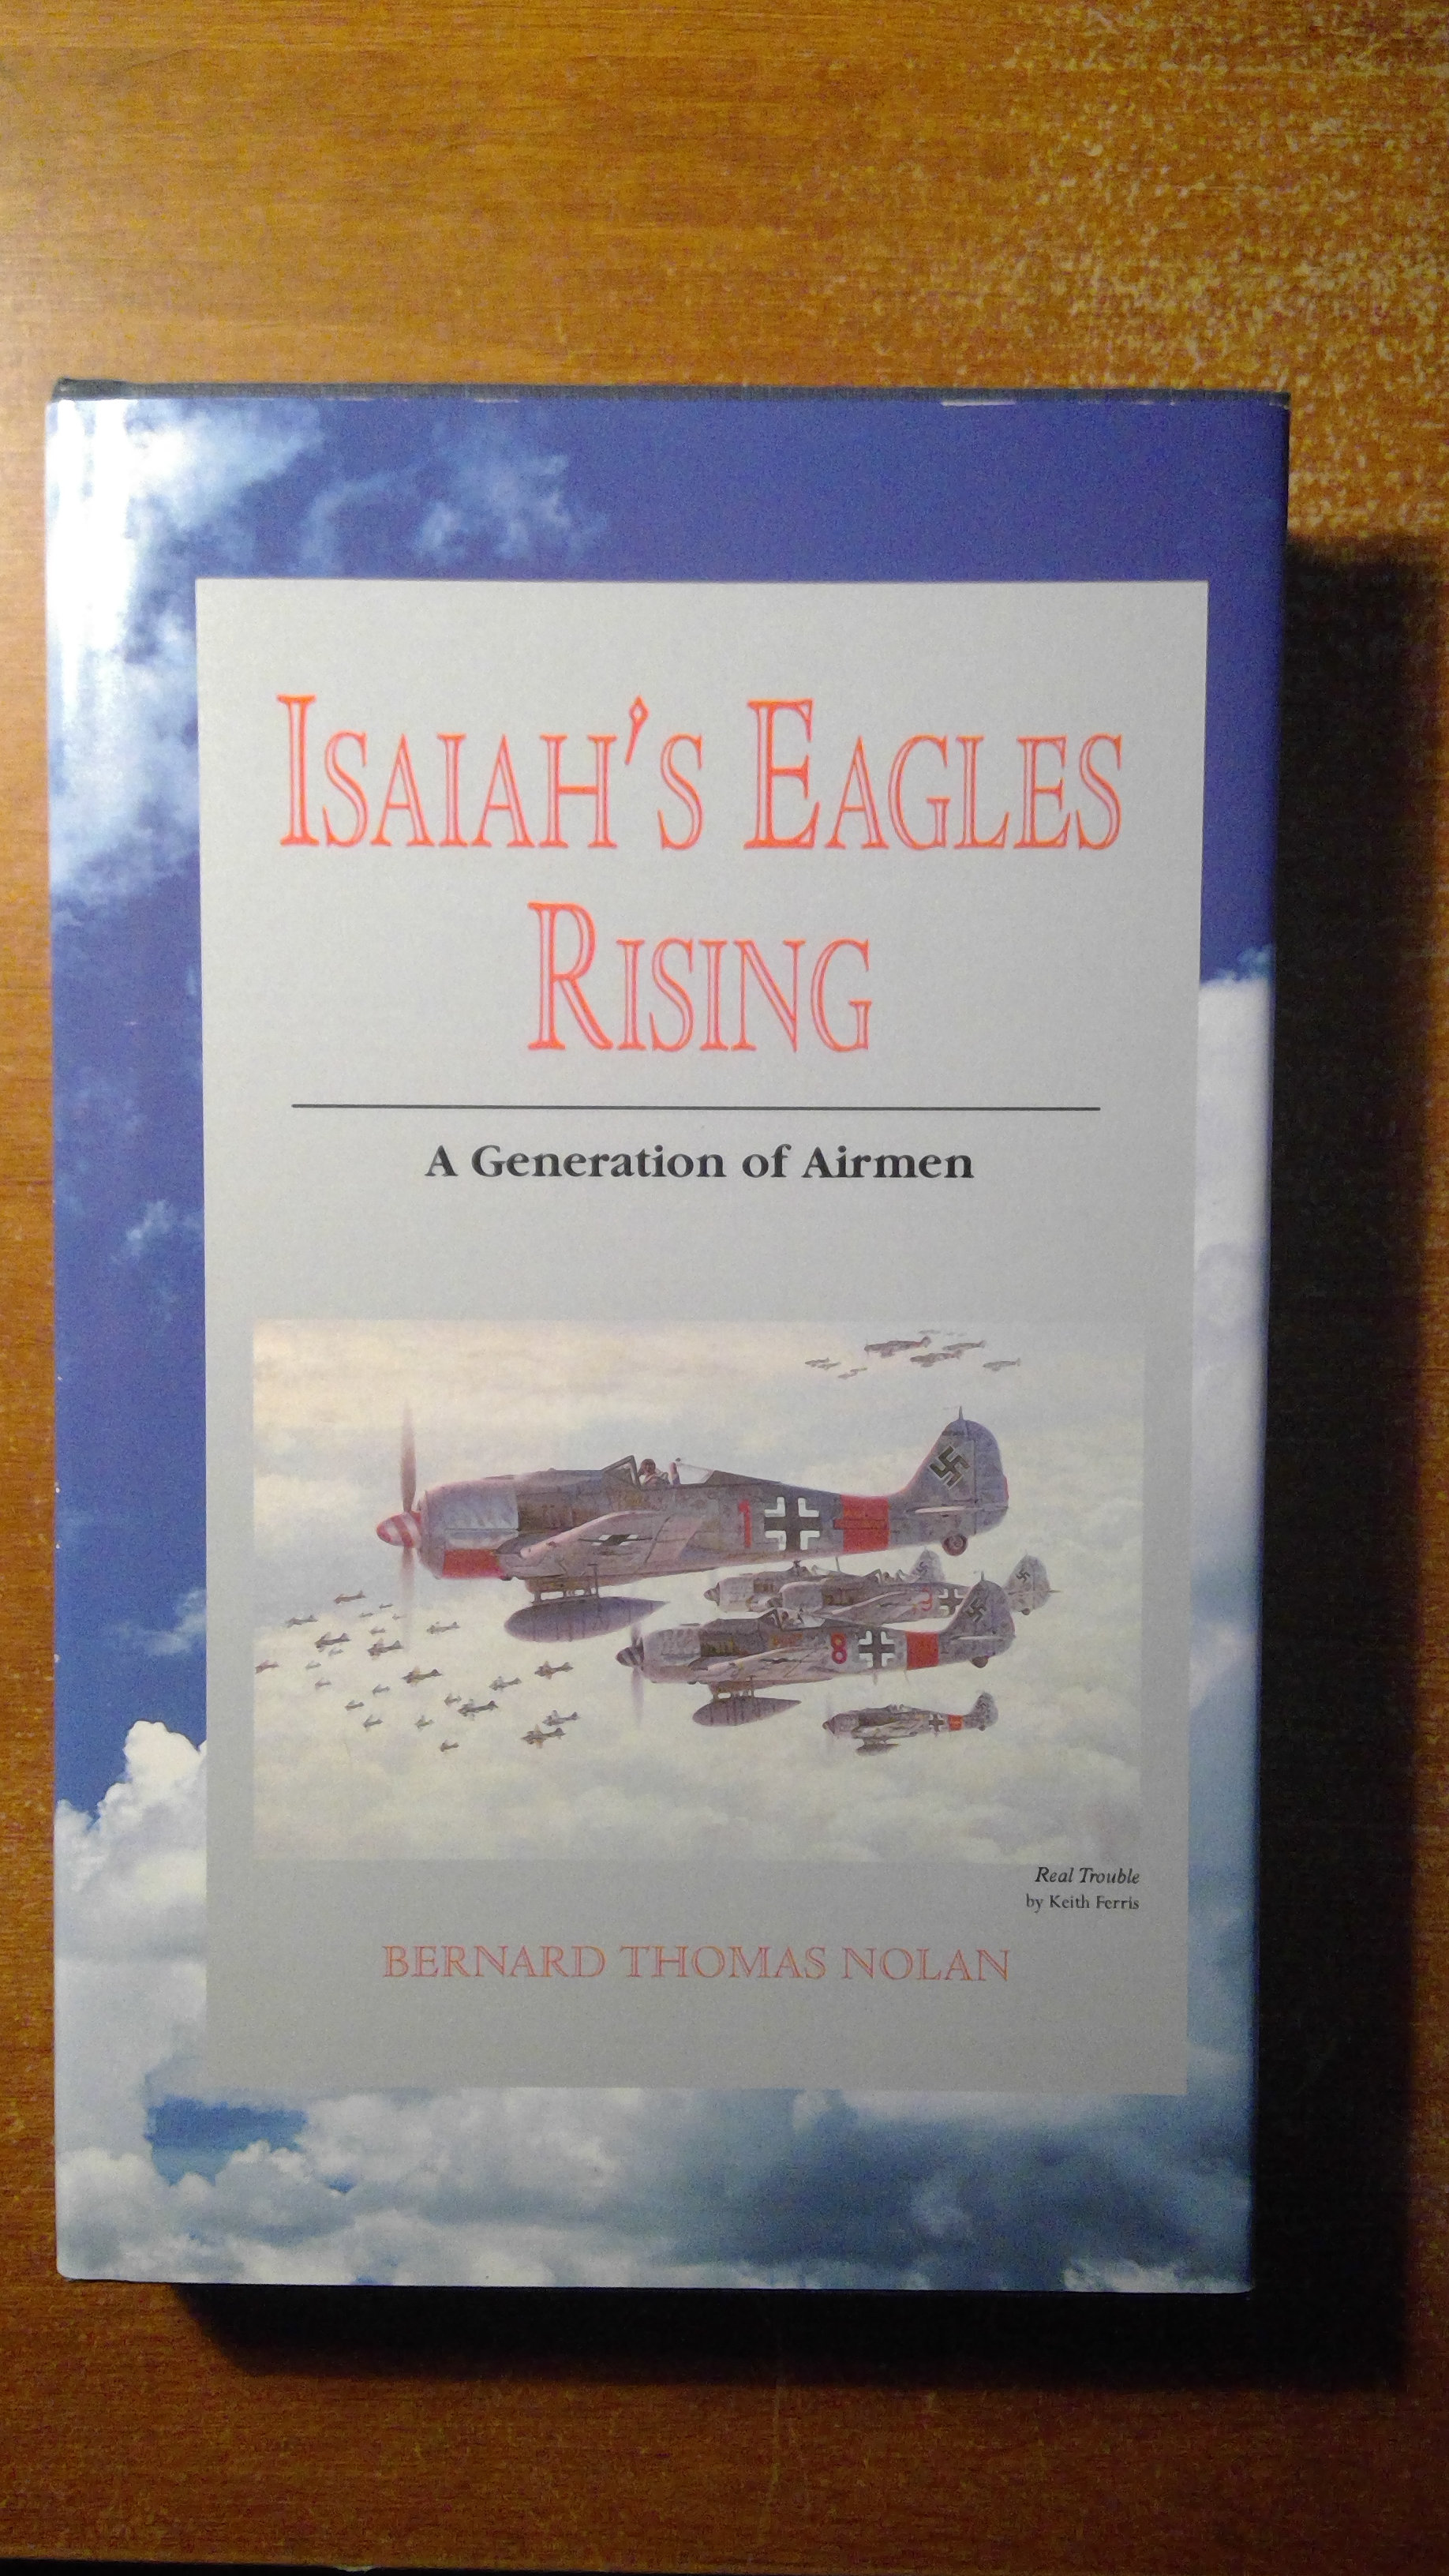 Hardback Isaiah's Eagles Rising by Bernard Thomas Nolan signed Bernie Nolan